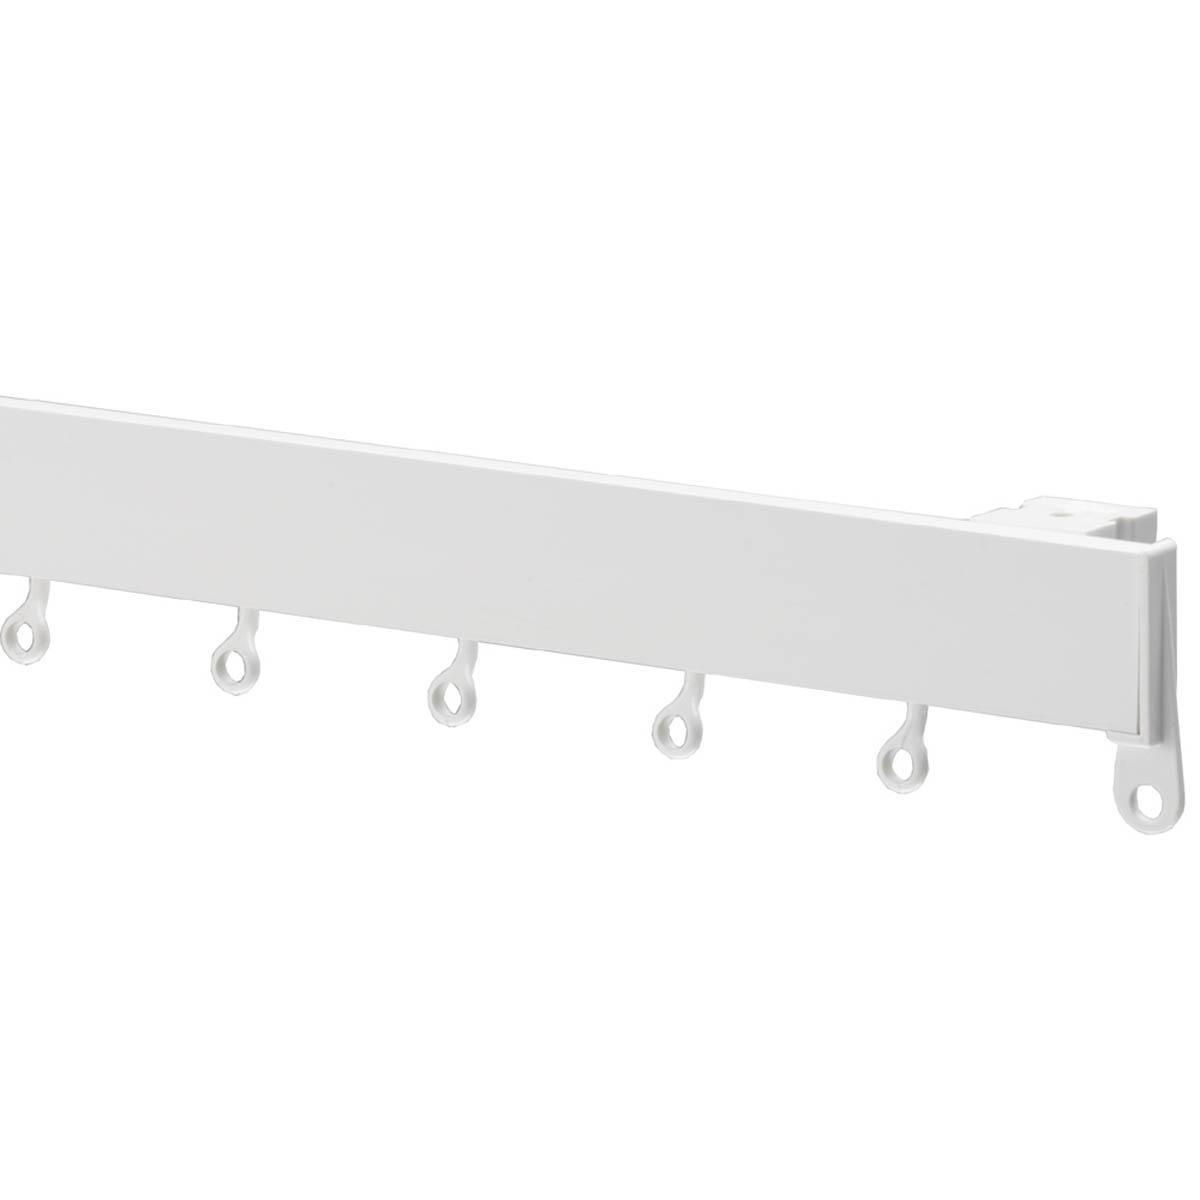 Swish Deluxe Curtain Track White Brackets (Pk 5): Amazon.co.uk ...